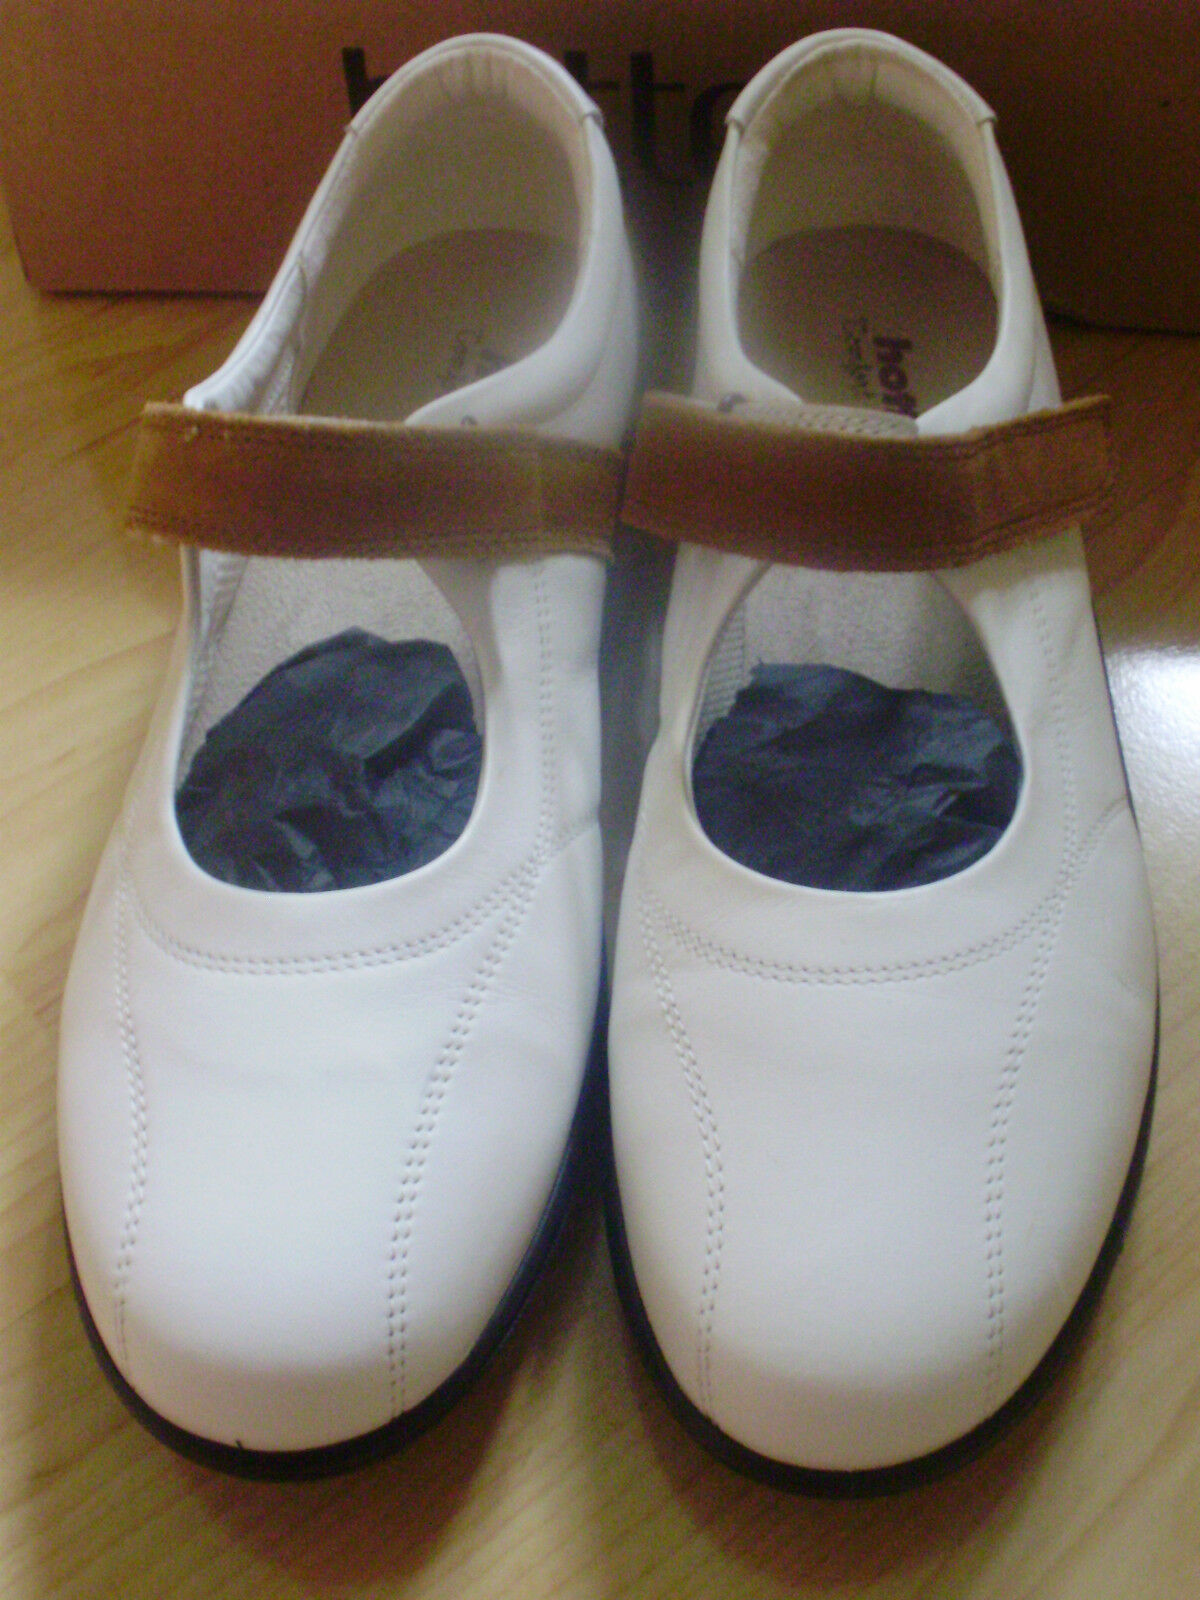 NEW HOTTER Schuhe 'HAPPY' Weiß LEATHER Schuhe HOTTER PUMPS FLATS UK 8 EUR 42 US 10 9b99fa